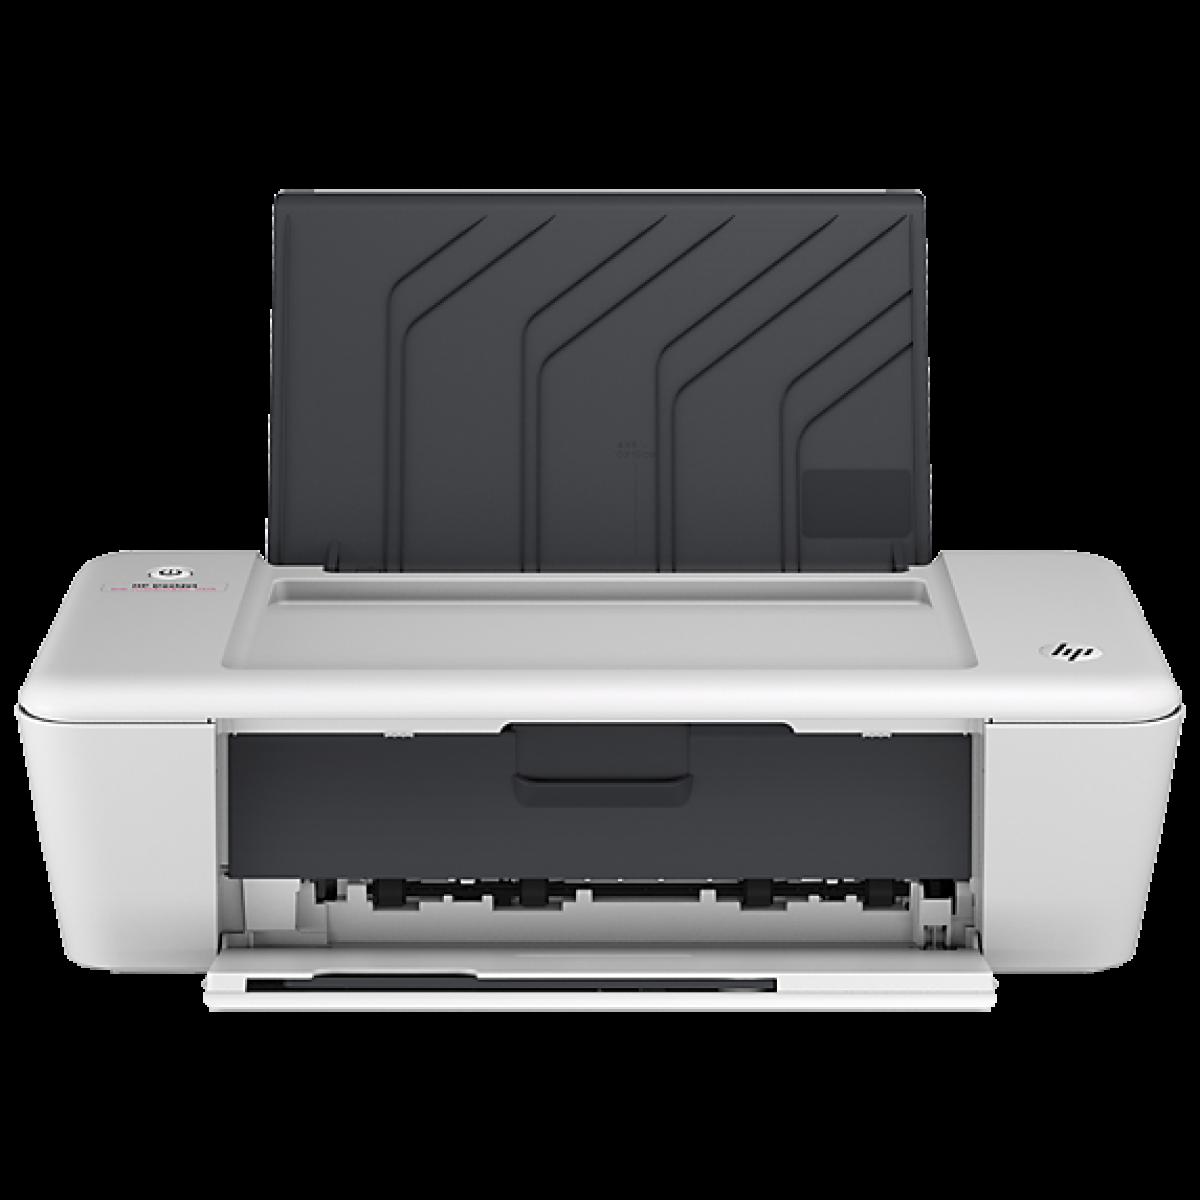 Printer HD PNG - 94778